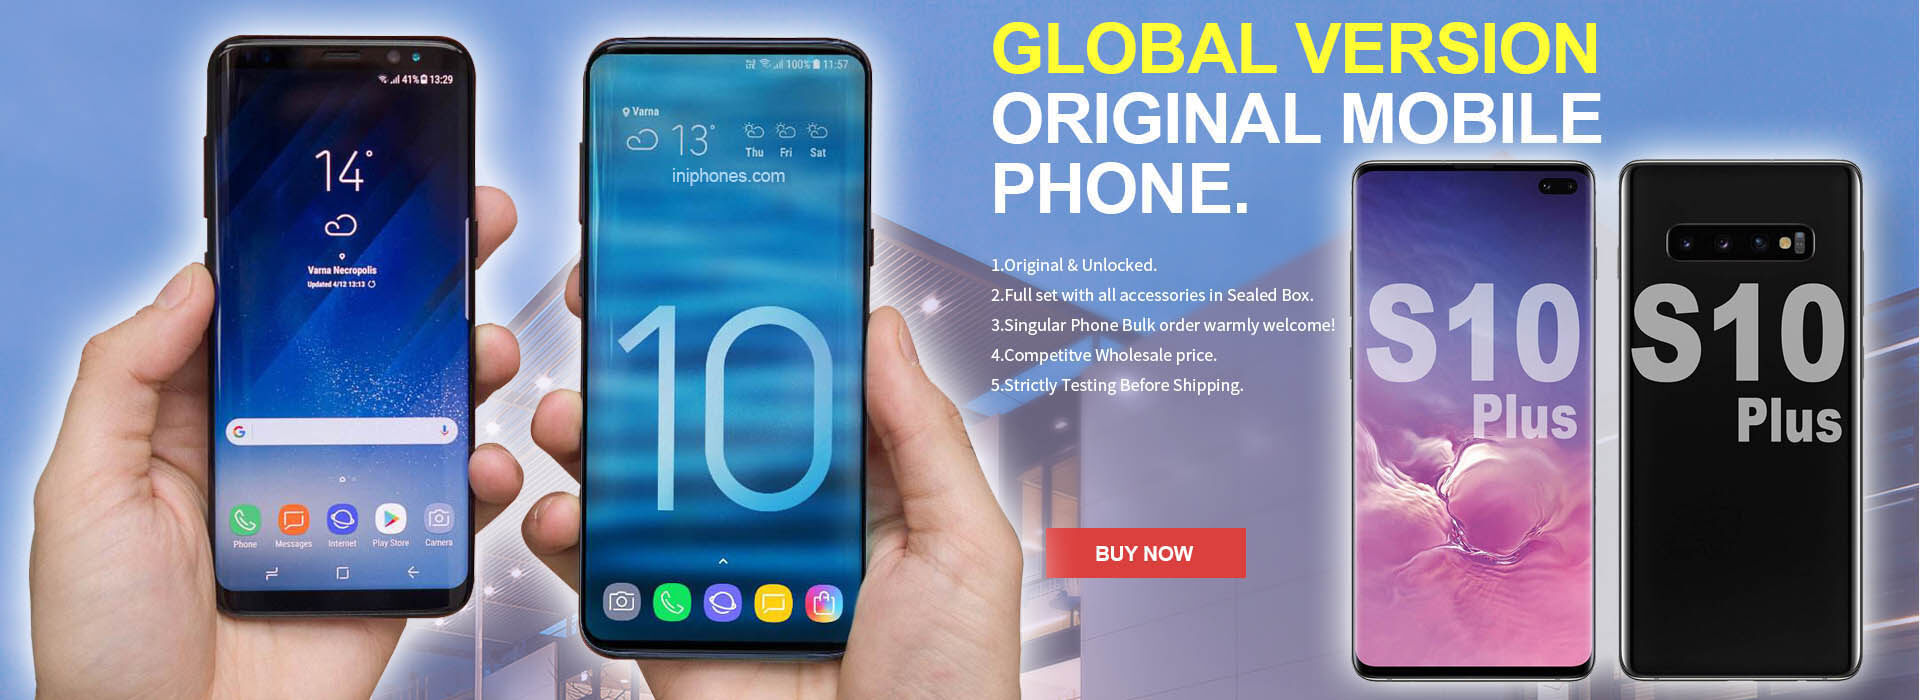 Unlocked used and refurbished samsung phones, galaxy series smartphones